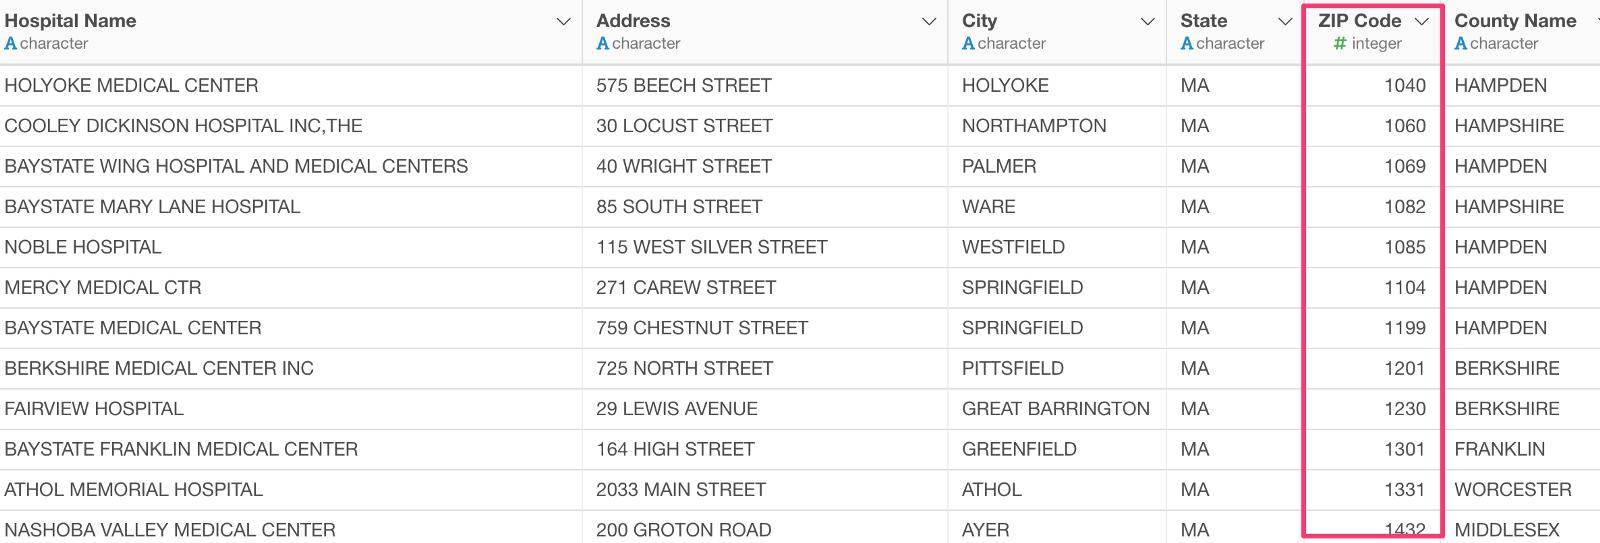 Geocoding US Address Data with Zipcode package